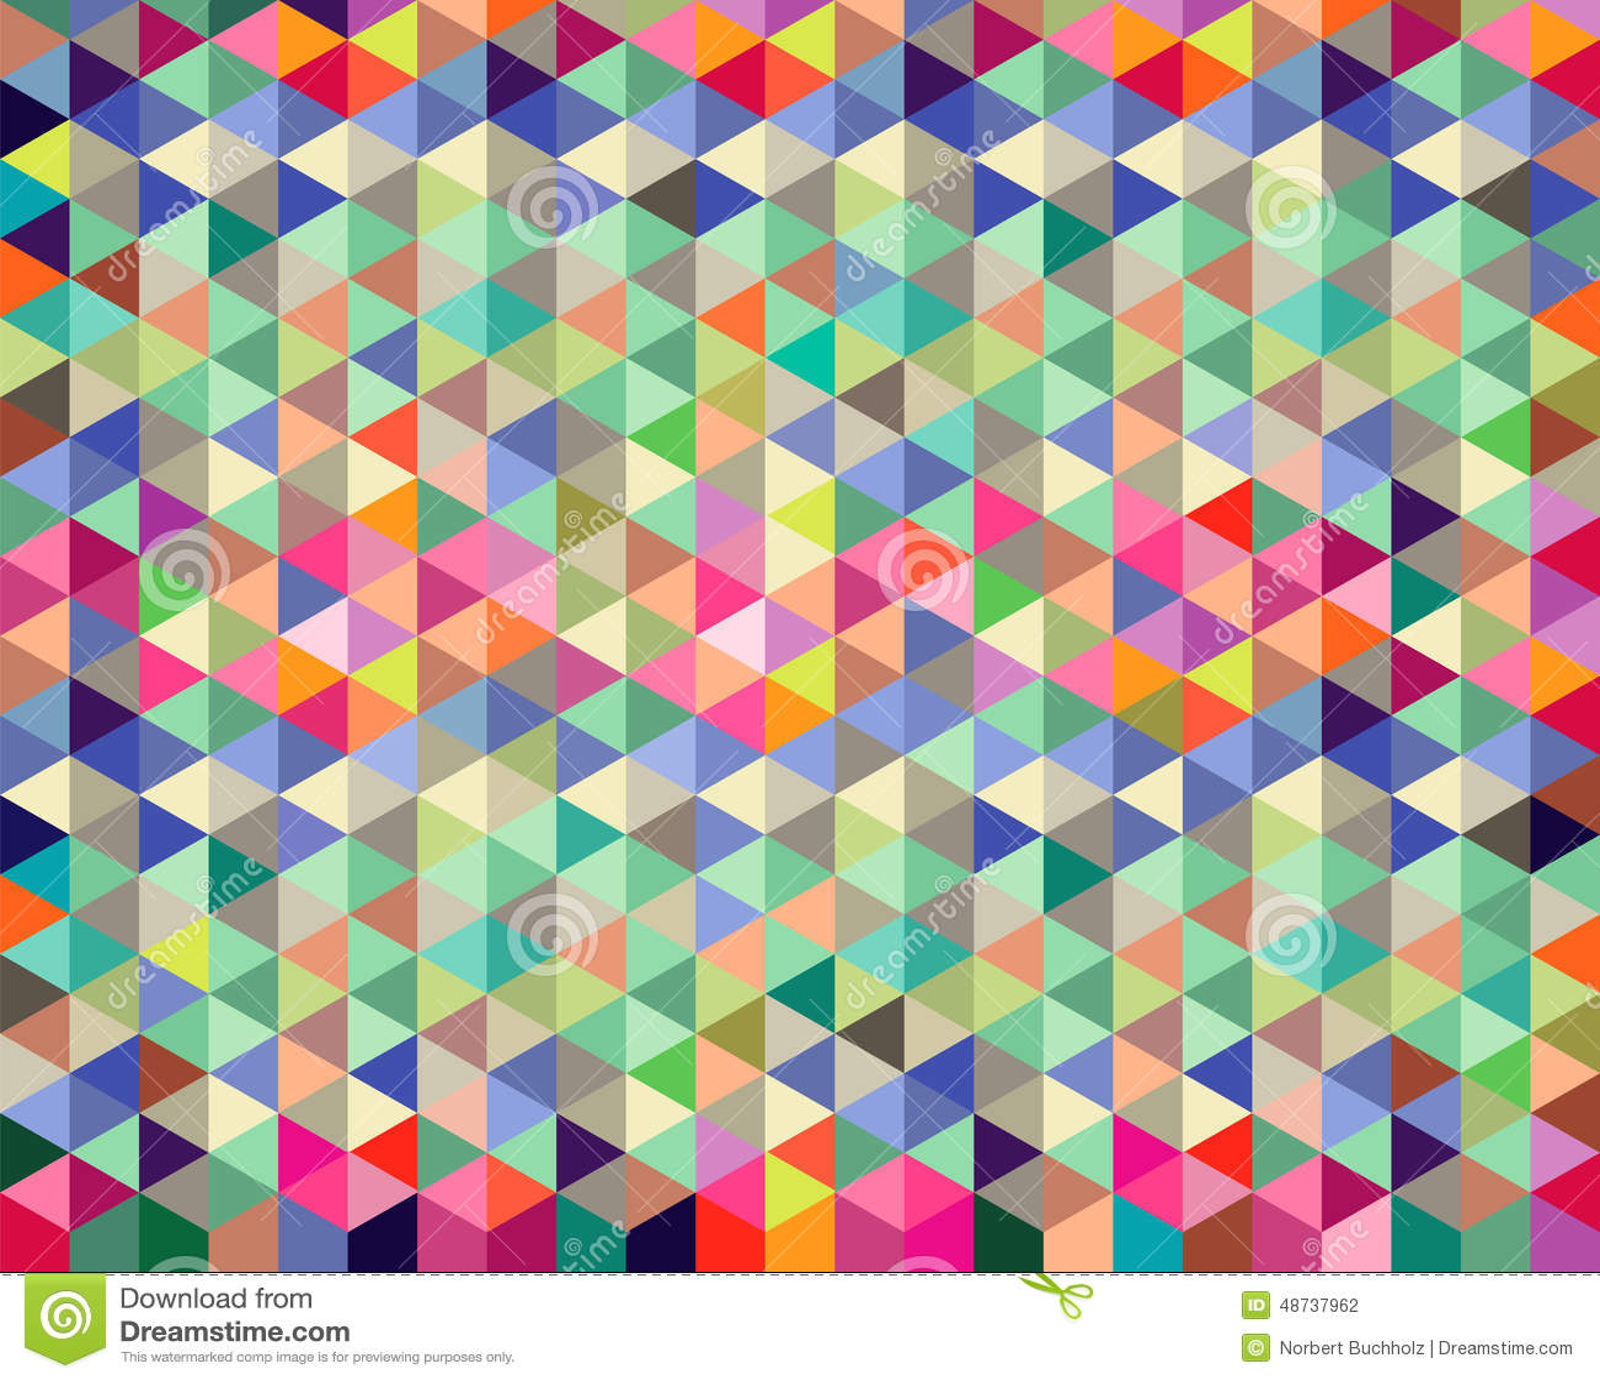 Painting Quilt Squares